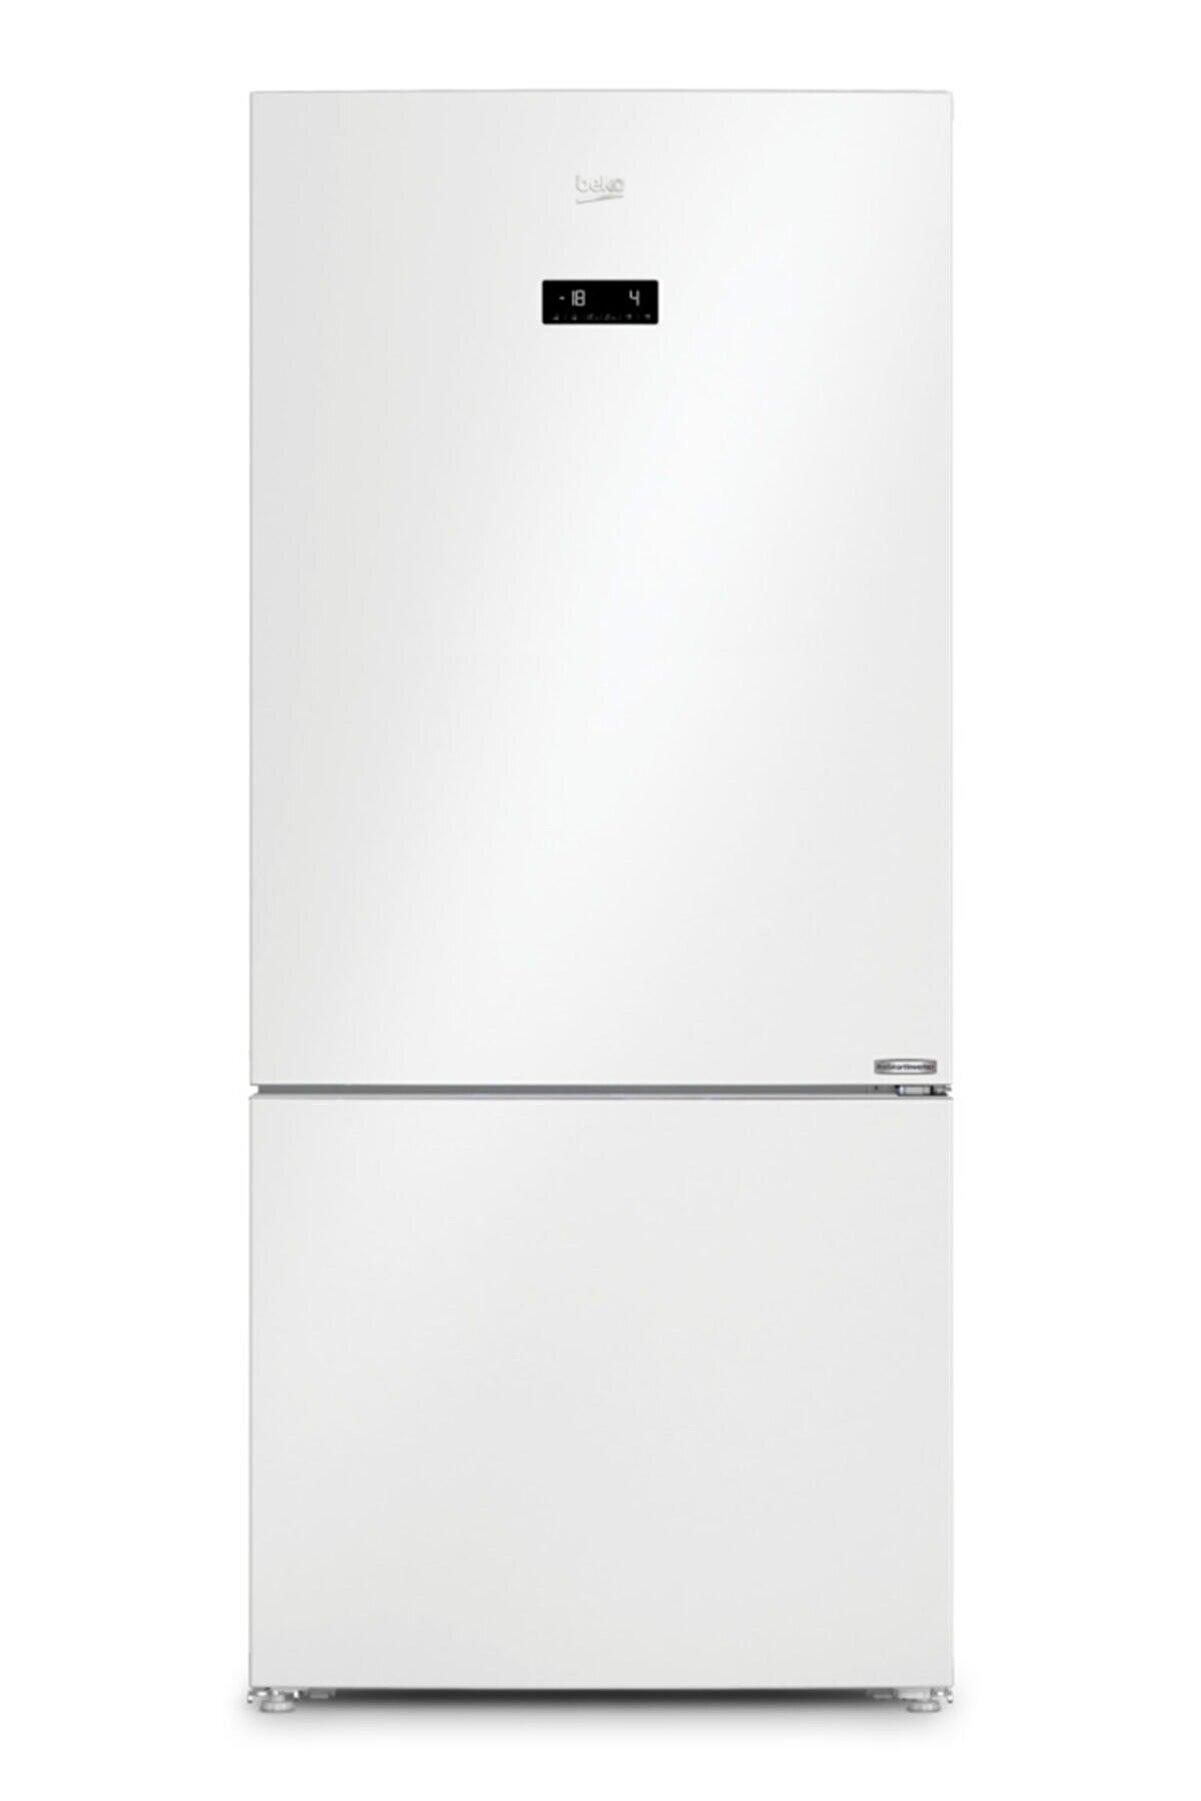 Beko 683721 Eb Xxl 720 Lt Buzdolabı Wifi Özellikli